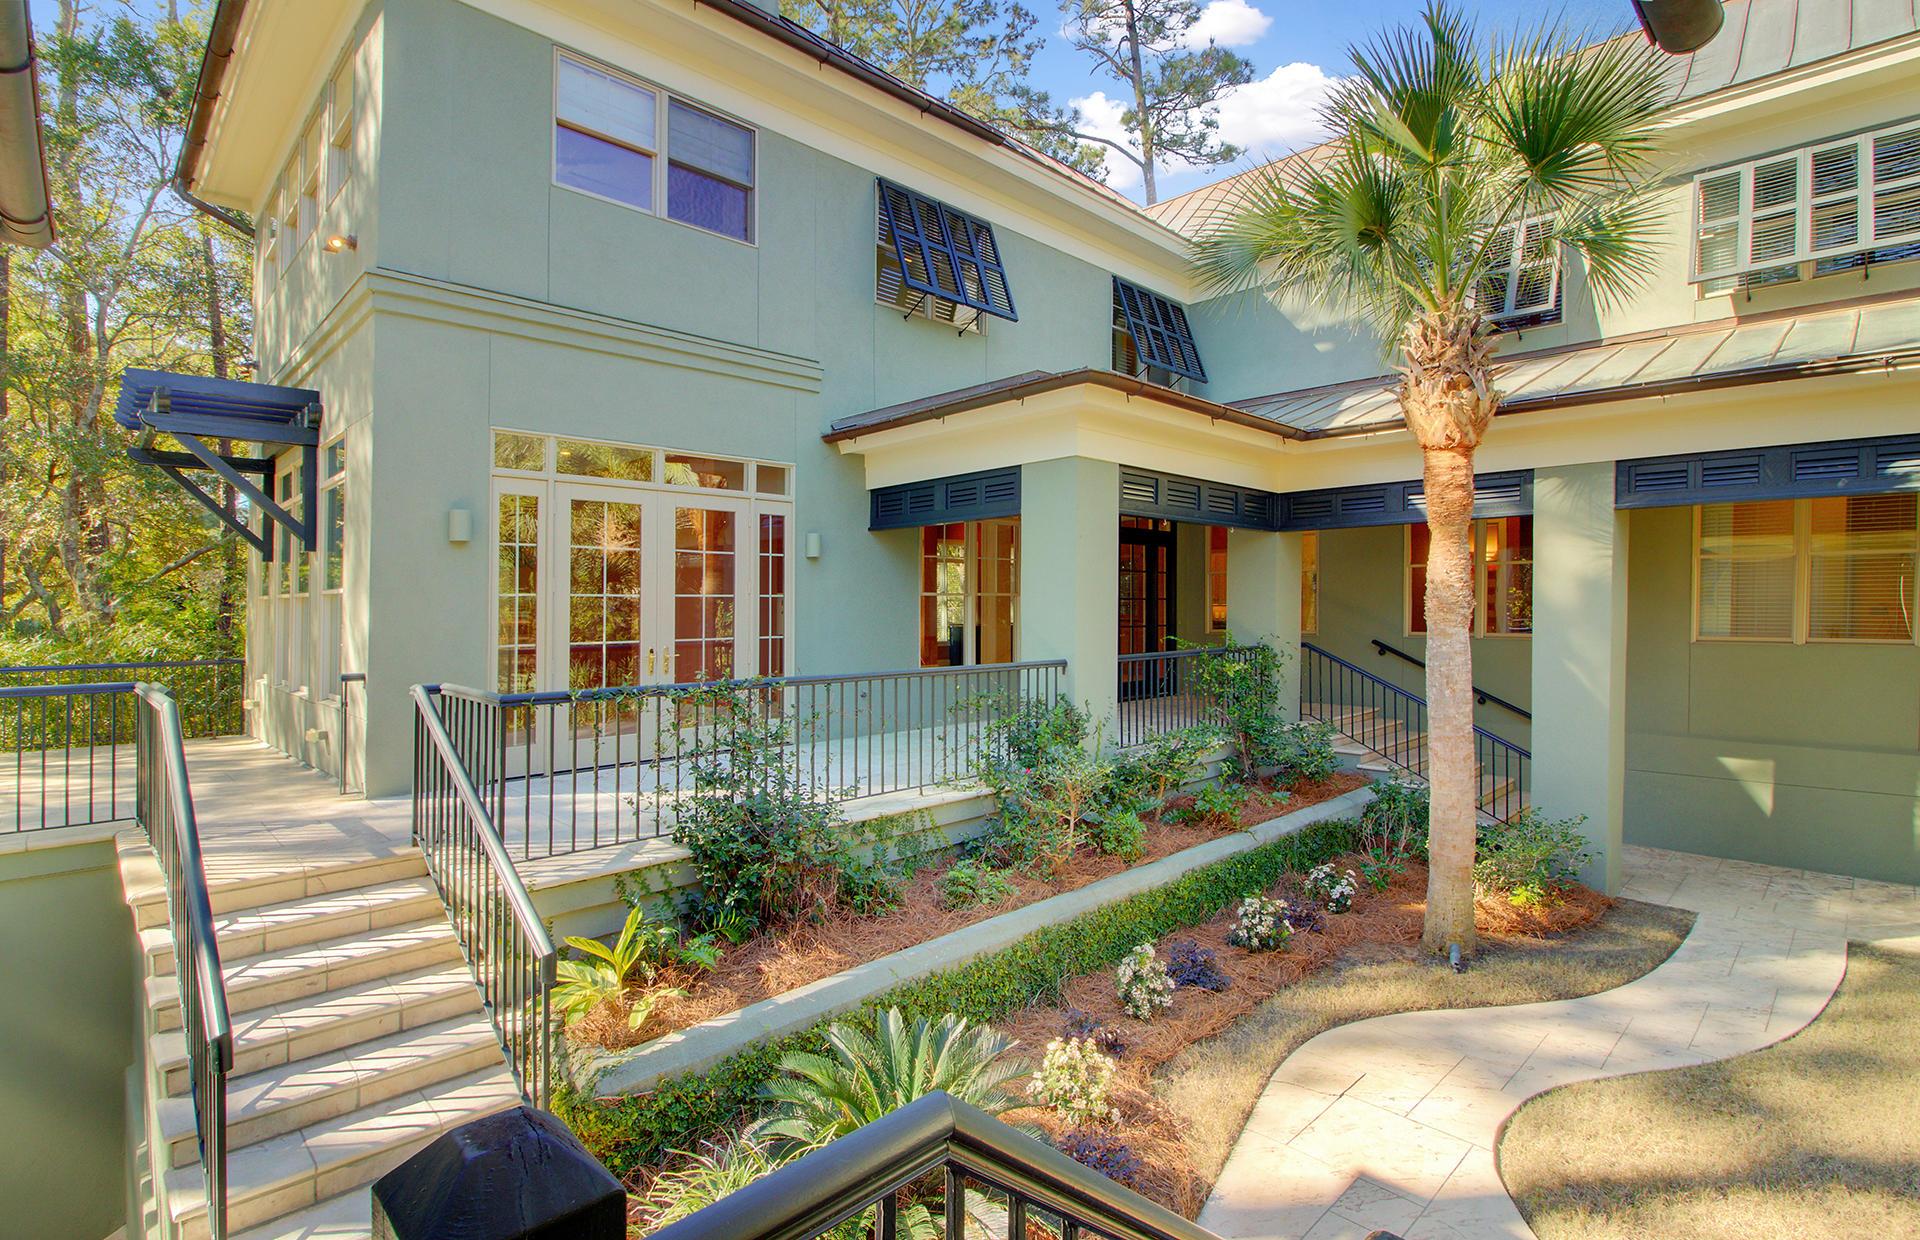 Kiawah Island Homes For Sale - 402 Ocean Oaks, Kiawah Island, SC - 49